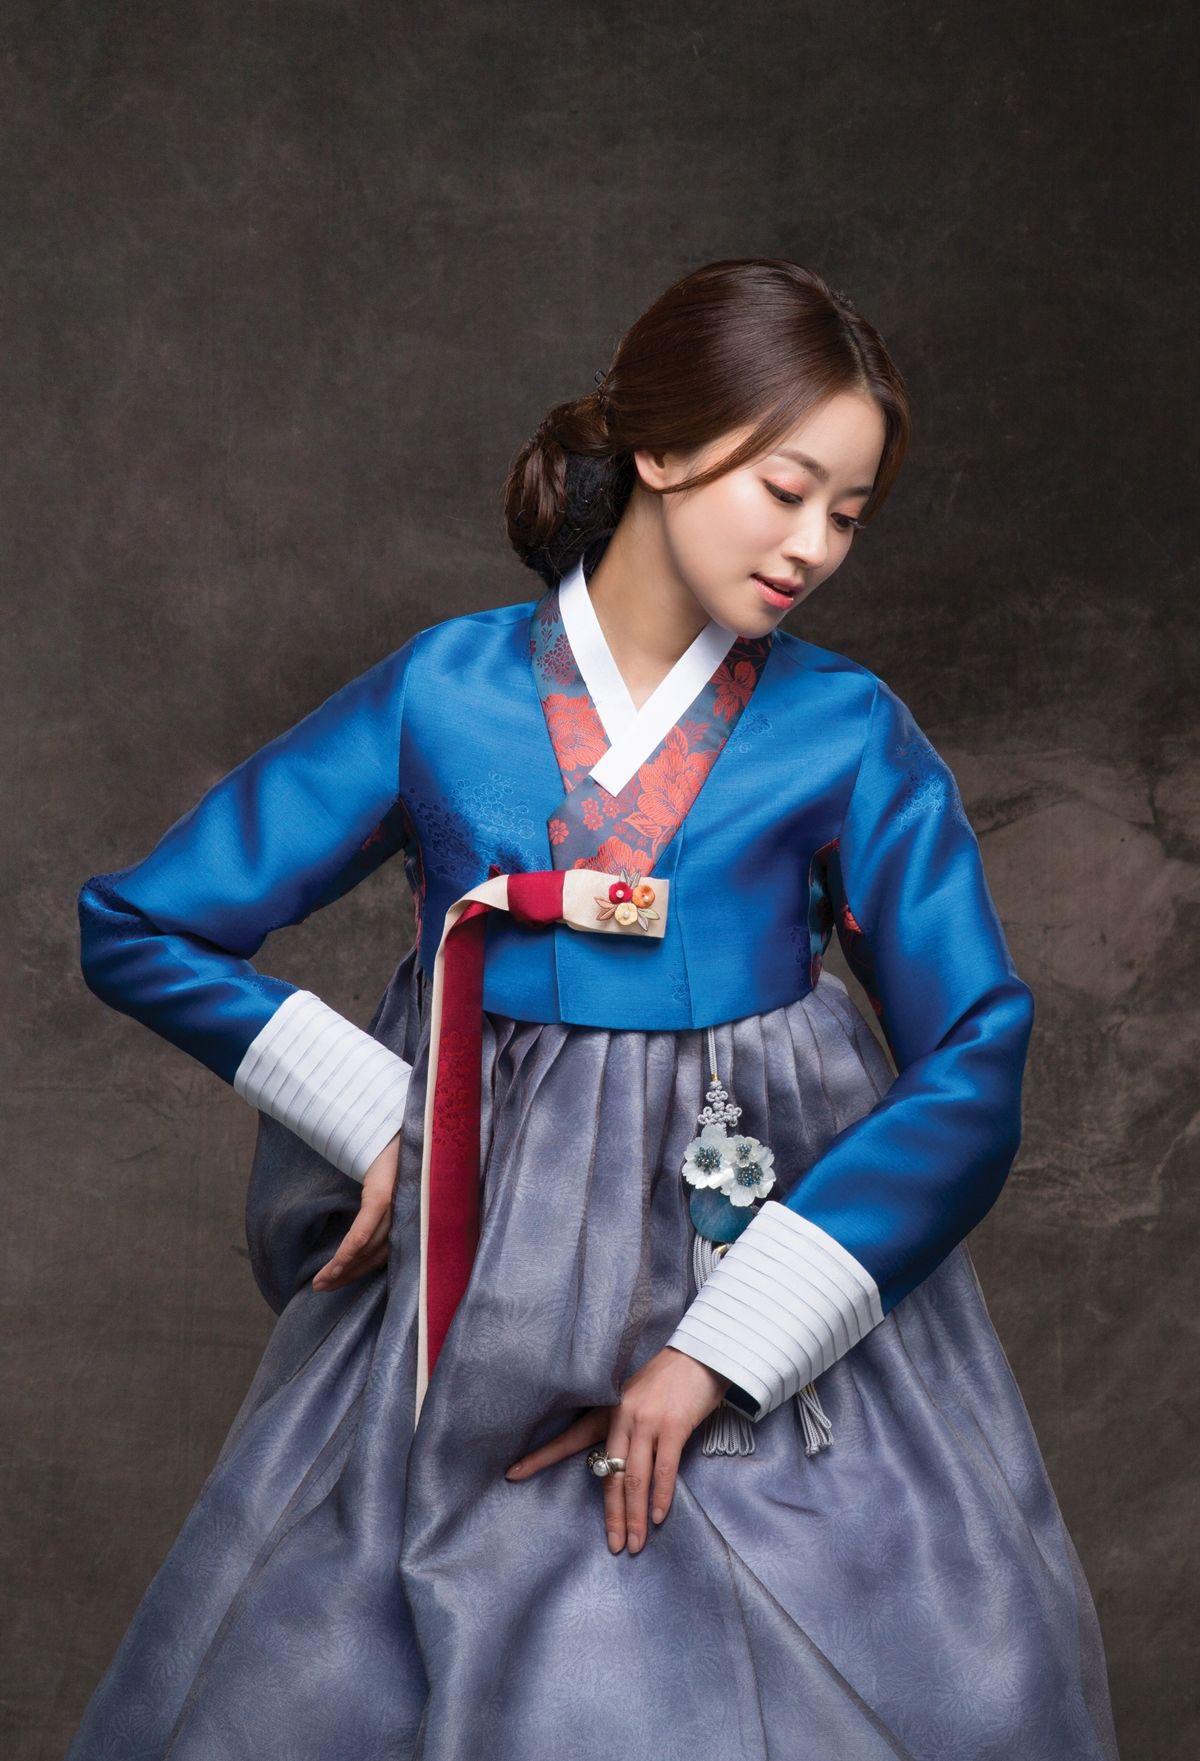 KHS064 KR Dress stores online